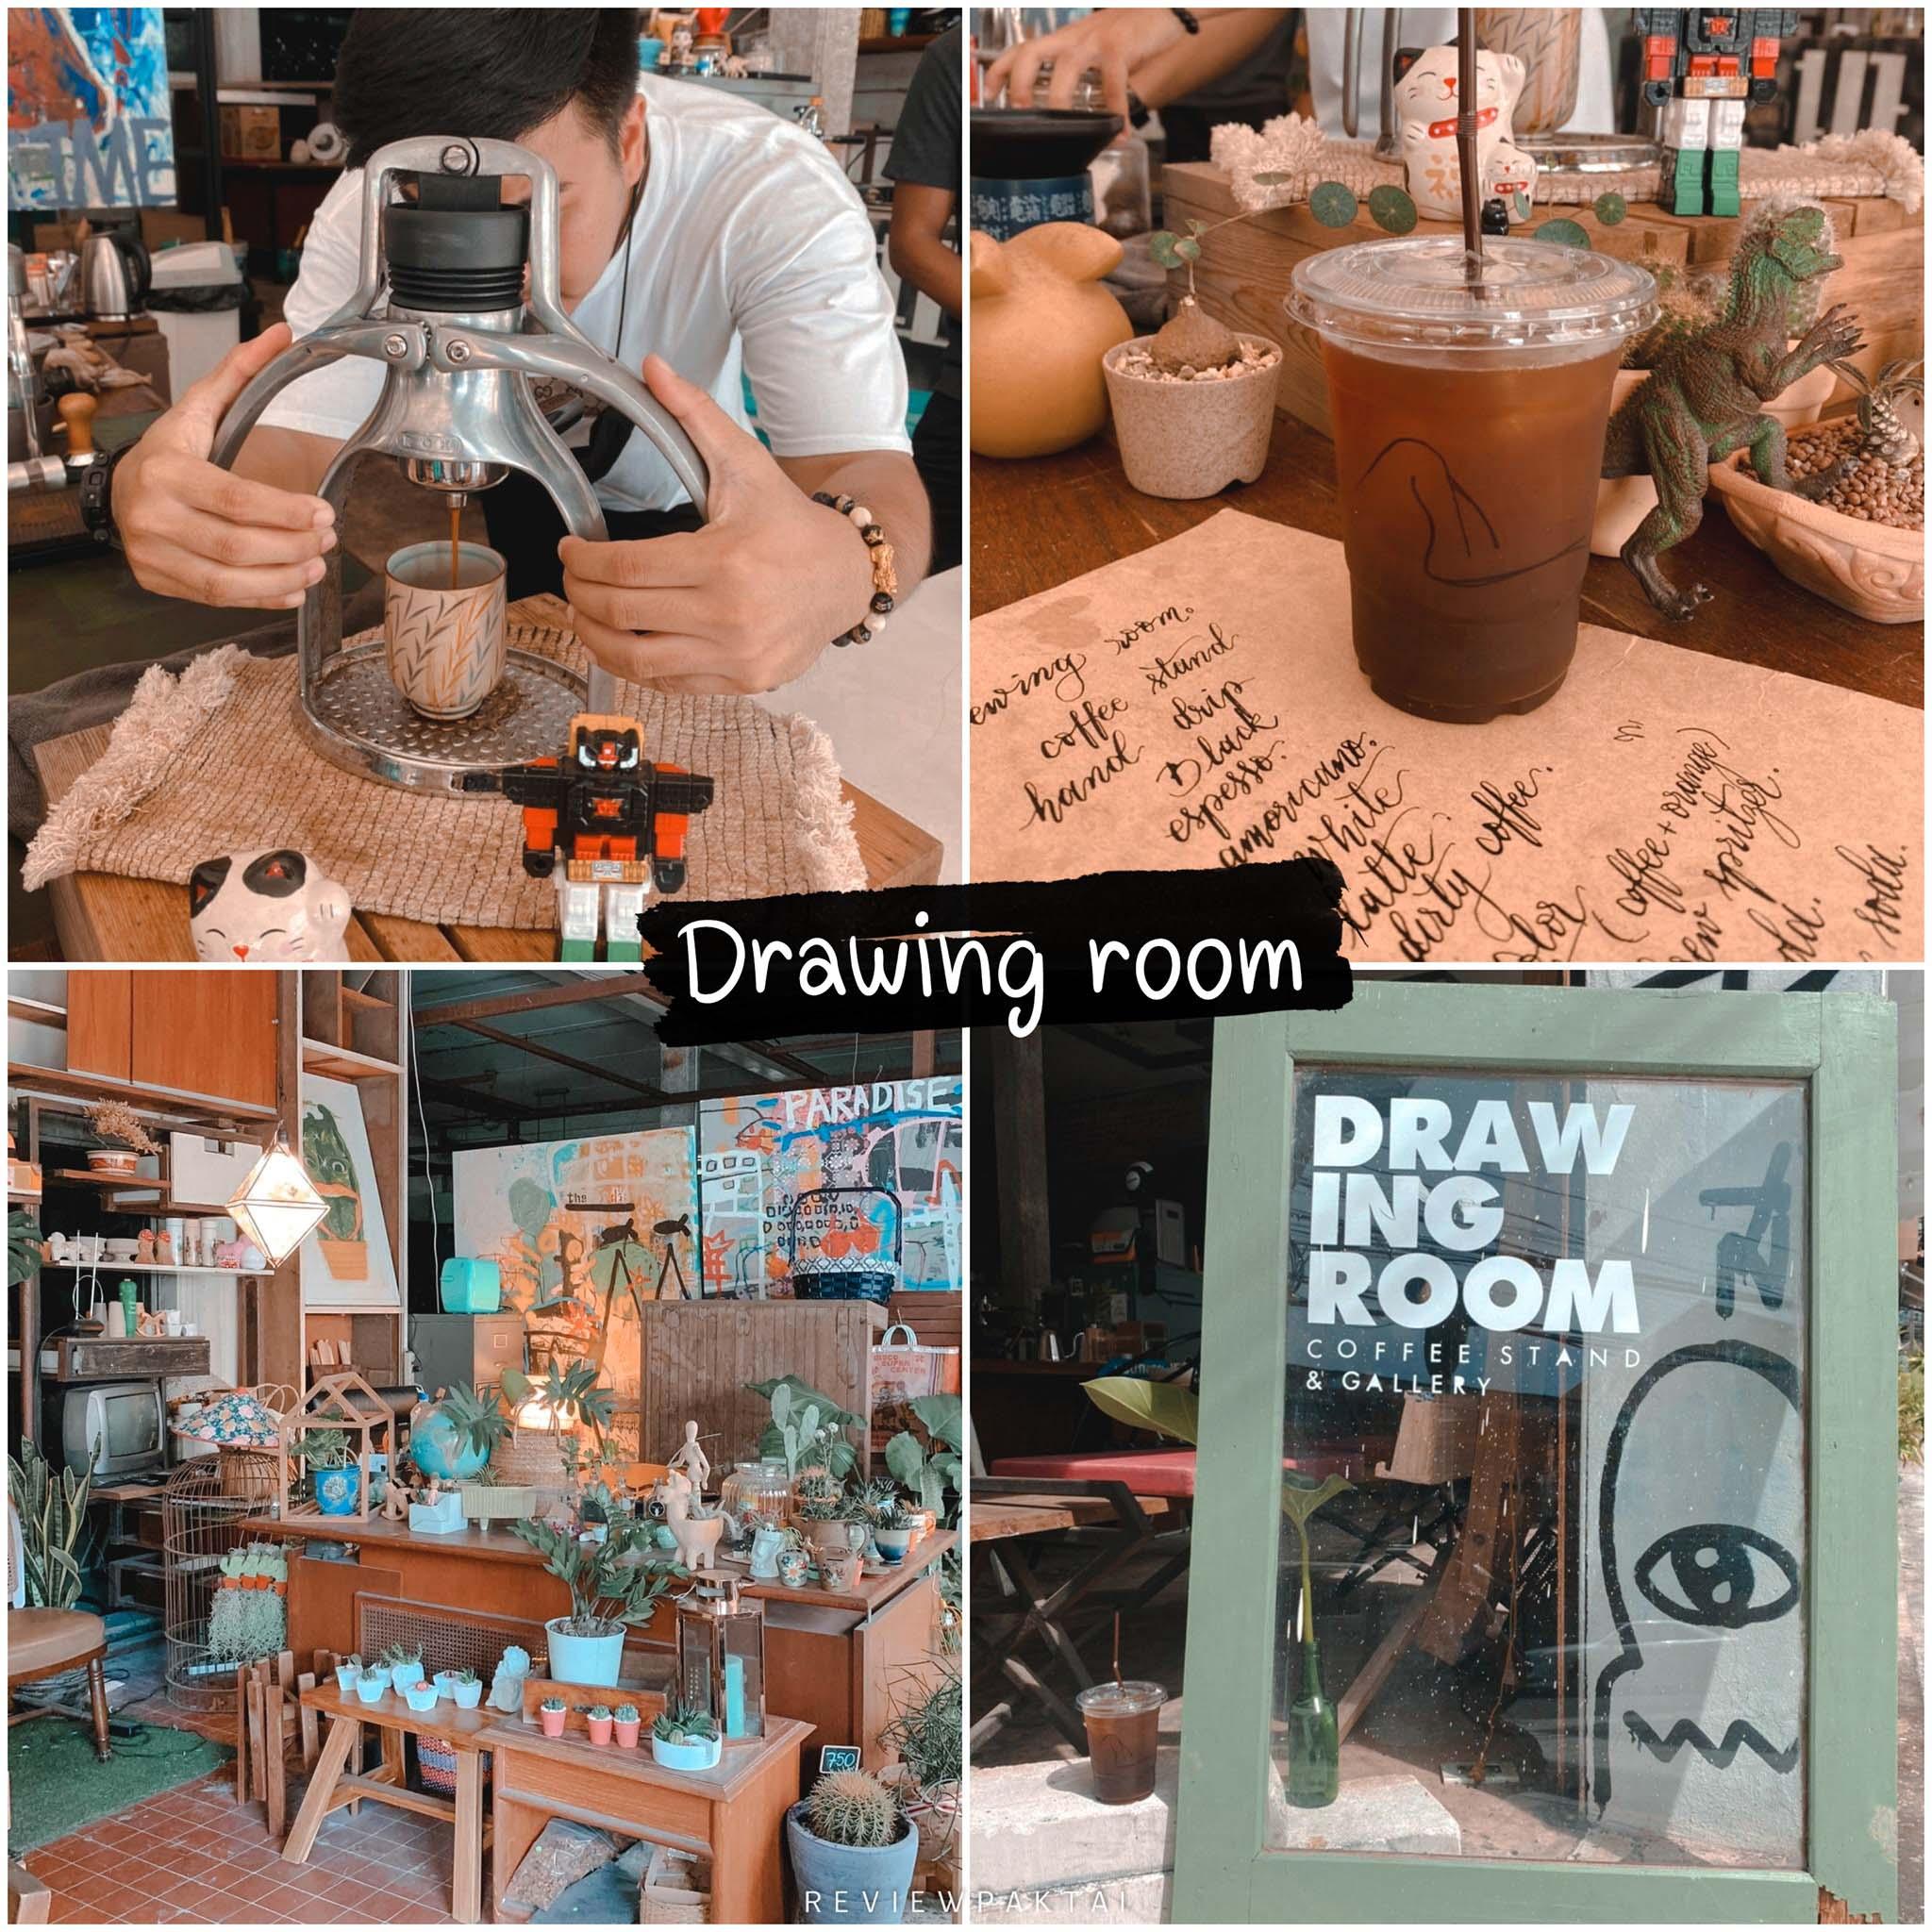 Drawing-room-coffee-and-gallery คาเฟ่ภูเก็ต-ที่แปลกใหม่ซึ่งแตกต่างจากคาเฟ่อื่น-ๆ-บนเกาะศิลปะและชีวิตแบบสโลว์ไลฟ์เพื่อเพิ่มประสิทธิกาแฟทางร้านใช้เครื่องชงกาแฟแบบใช้มือเพิ่มความหอมของกาแฟทุกแก้วที่แตกต่างกัน-คาเฟ่ออกแนวศิลปะจะมีรูปภาพและคำพูดอยู่บนถ้วย-พลาดไปซัตเตอร์รูปสวยๆคูลๆกันไม่ได้แล้ว ภูเก็ต,คาเฟ่,ที่เที่ยว,ร้านกาแฟ,เด็ด,อร่อย,ต้องลอง